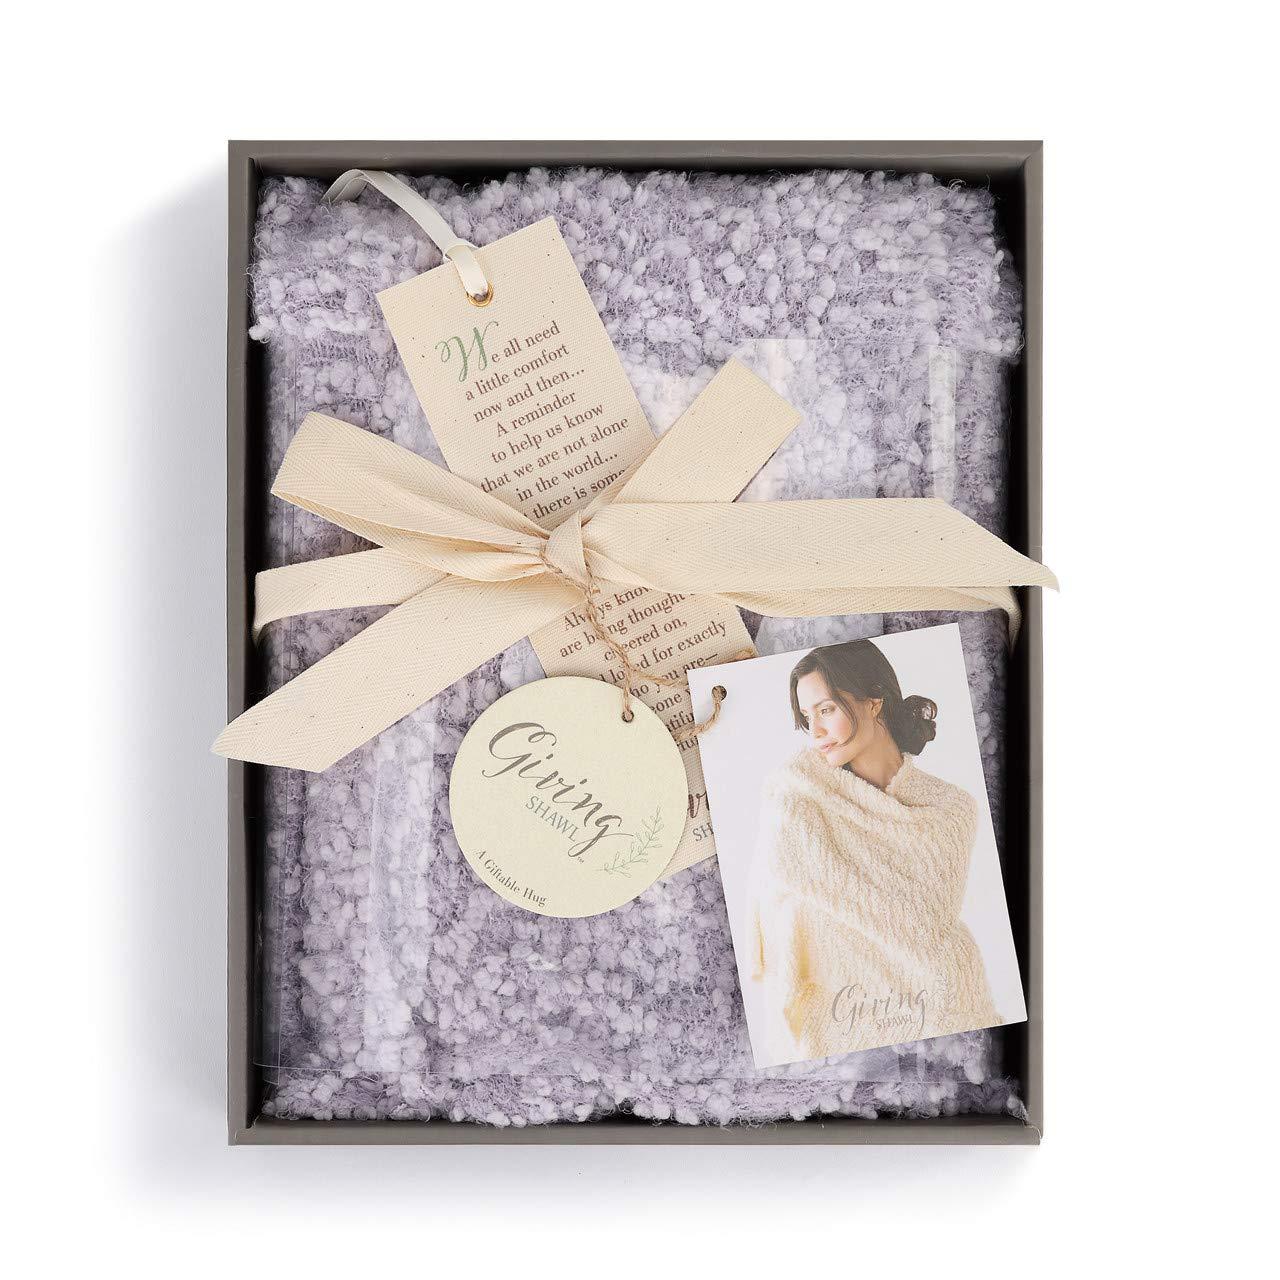 DEMDACO Giving Encourage Light Purple 70 x 27 Nylon Fabric Pashmina Shawl with Bookmark